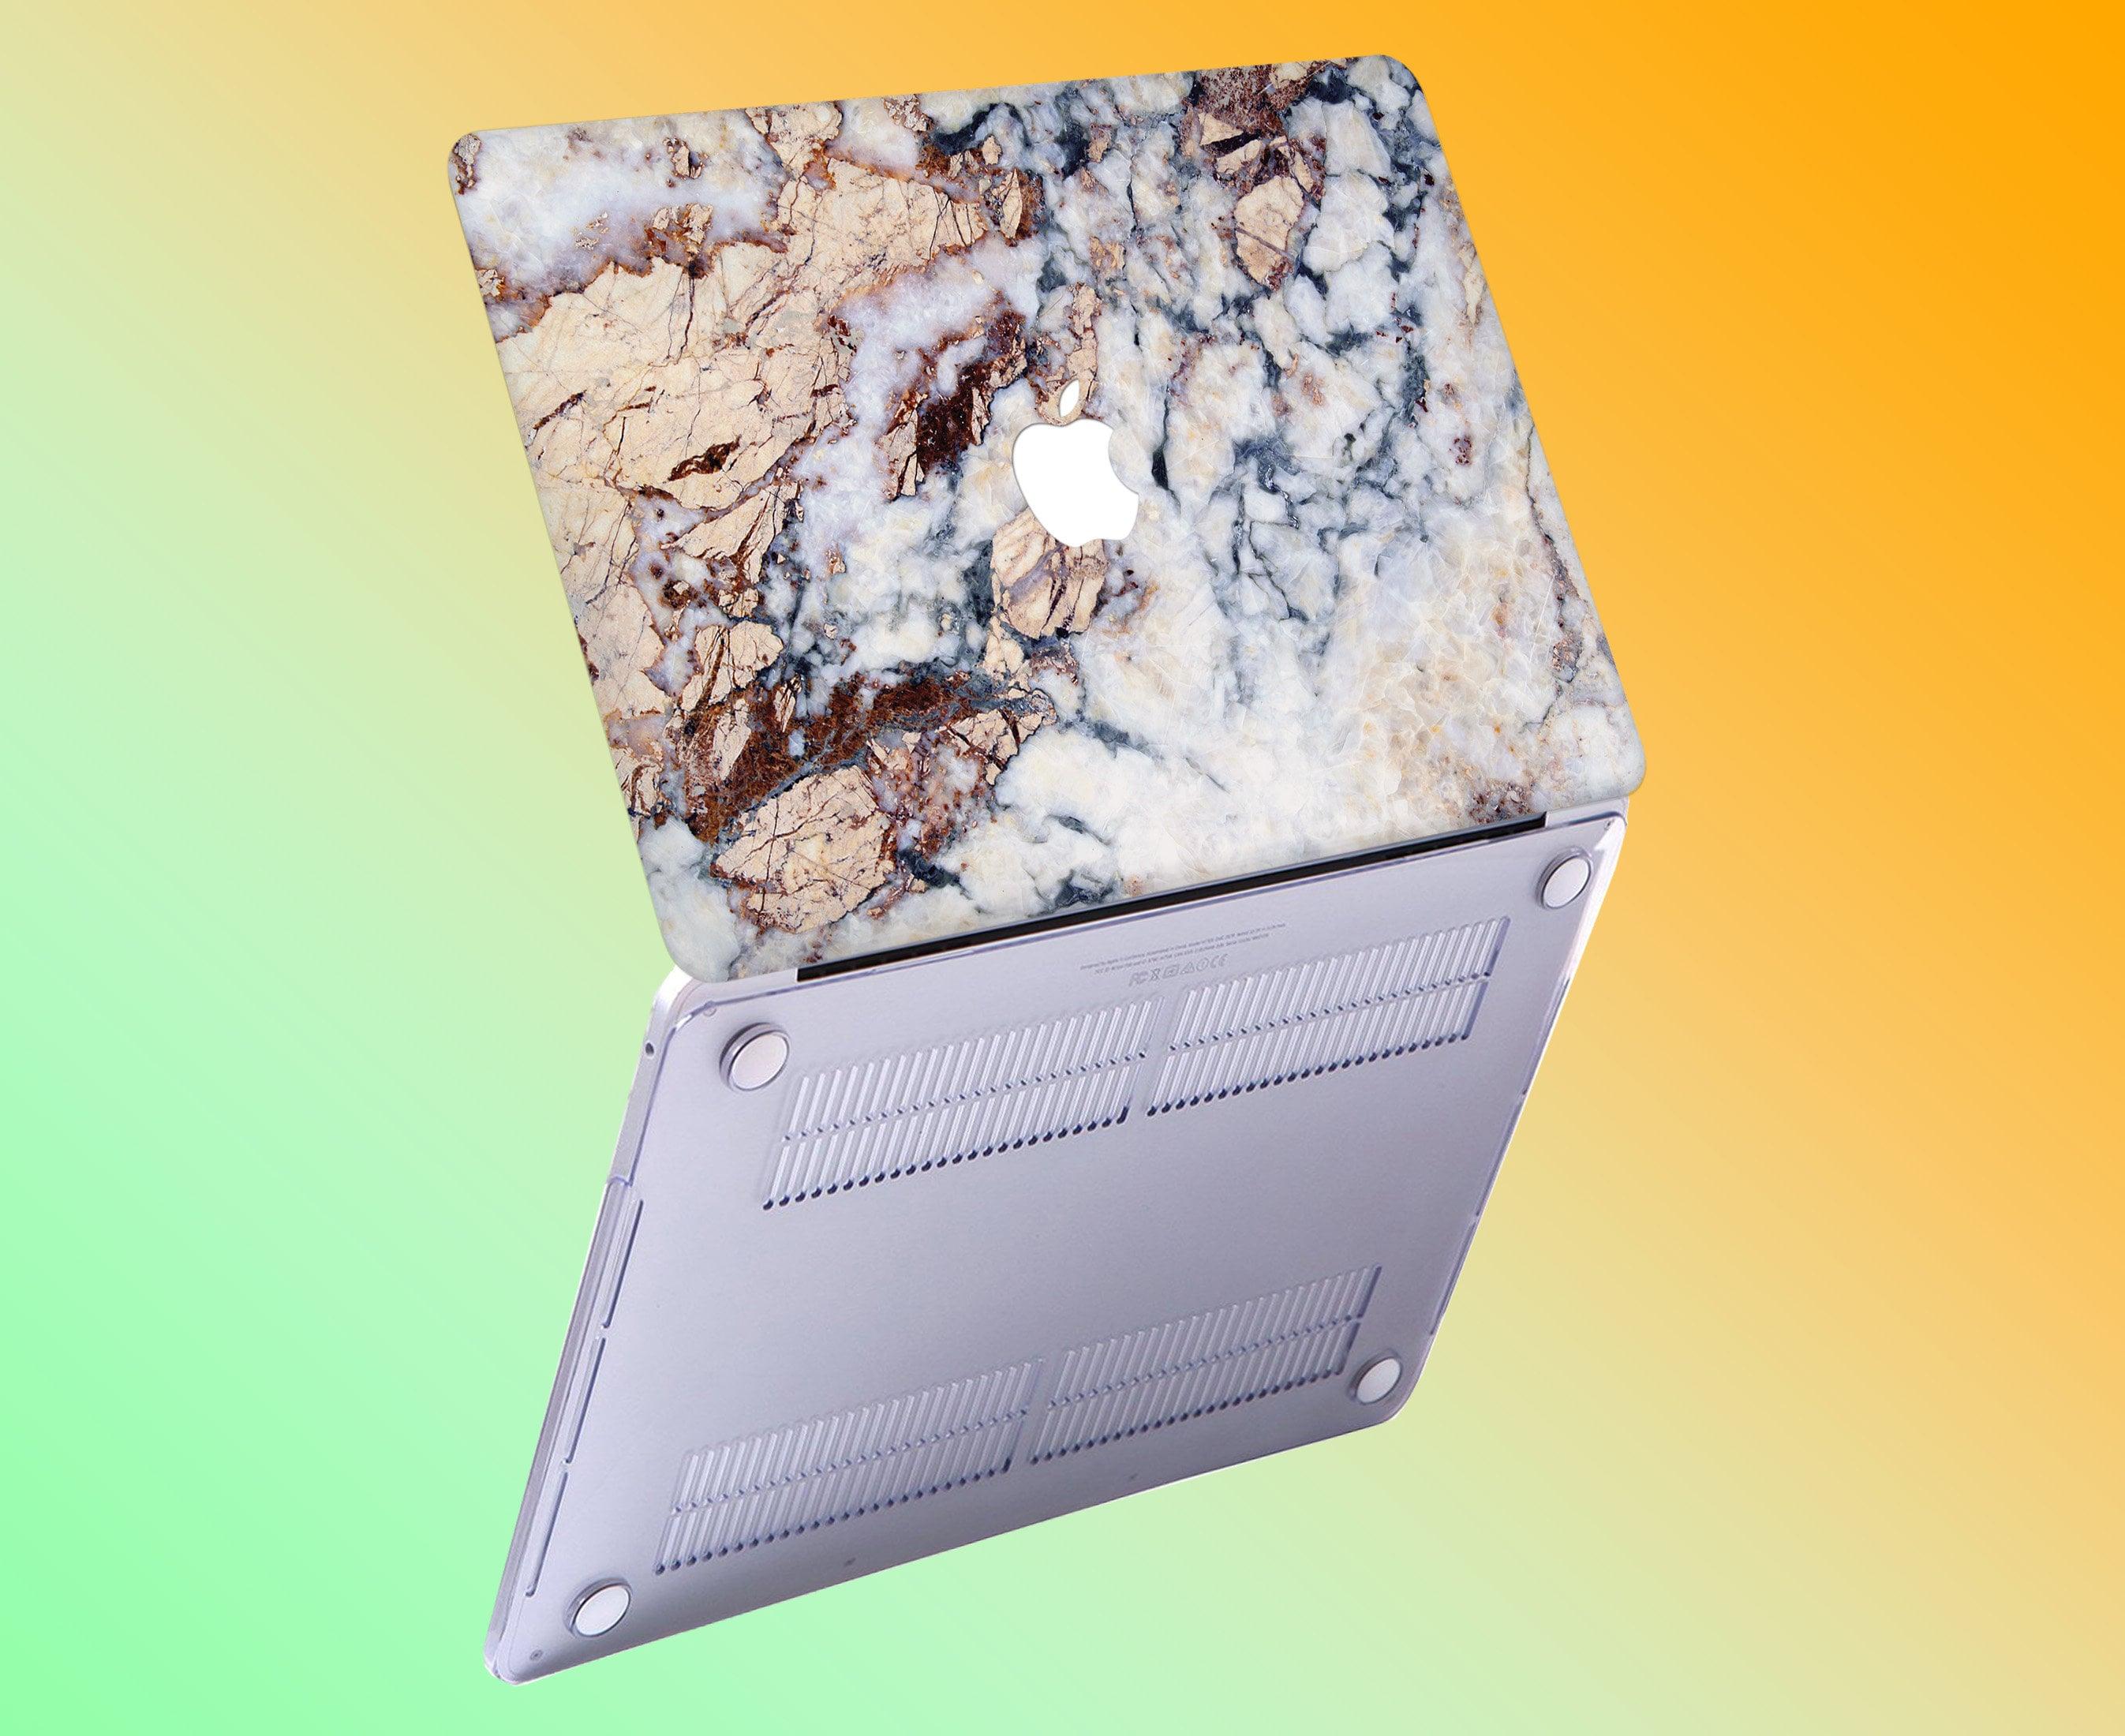 Macbook Pro 16 Case Beige Marble Macbook Air 13 Case 2021 ...